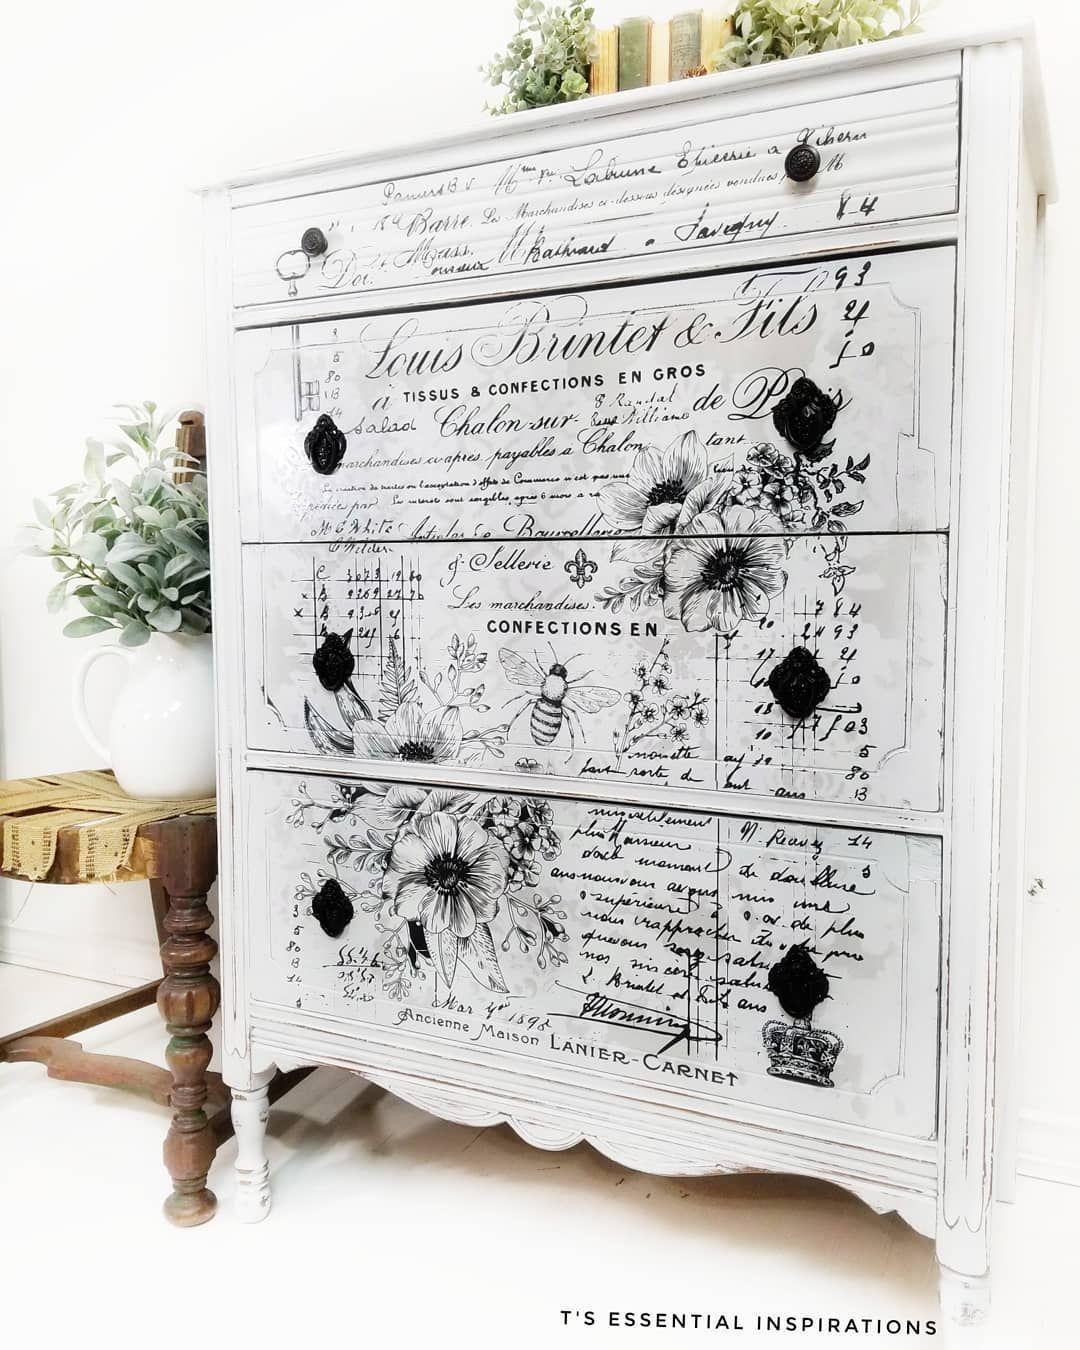 "T's Essential Inspirations on Instagram: ""Lovely ledger 🖤  #tsessentialinspirations #vintage #painted #furnitureartist #furnituremakeover #primadesign #prima #primalove #wyoming…"""